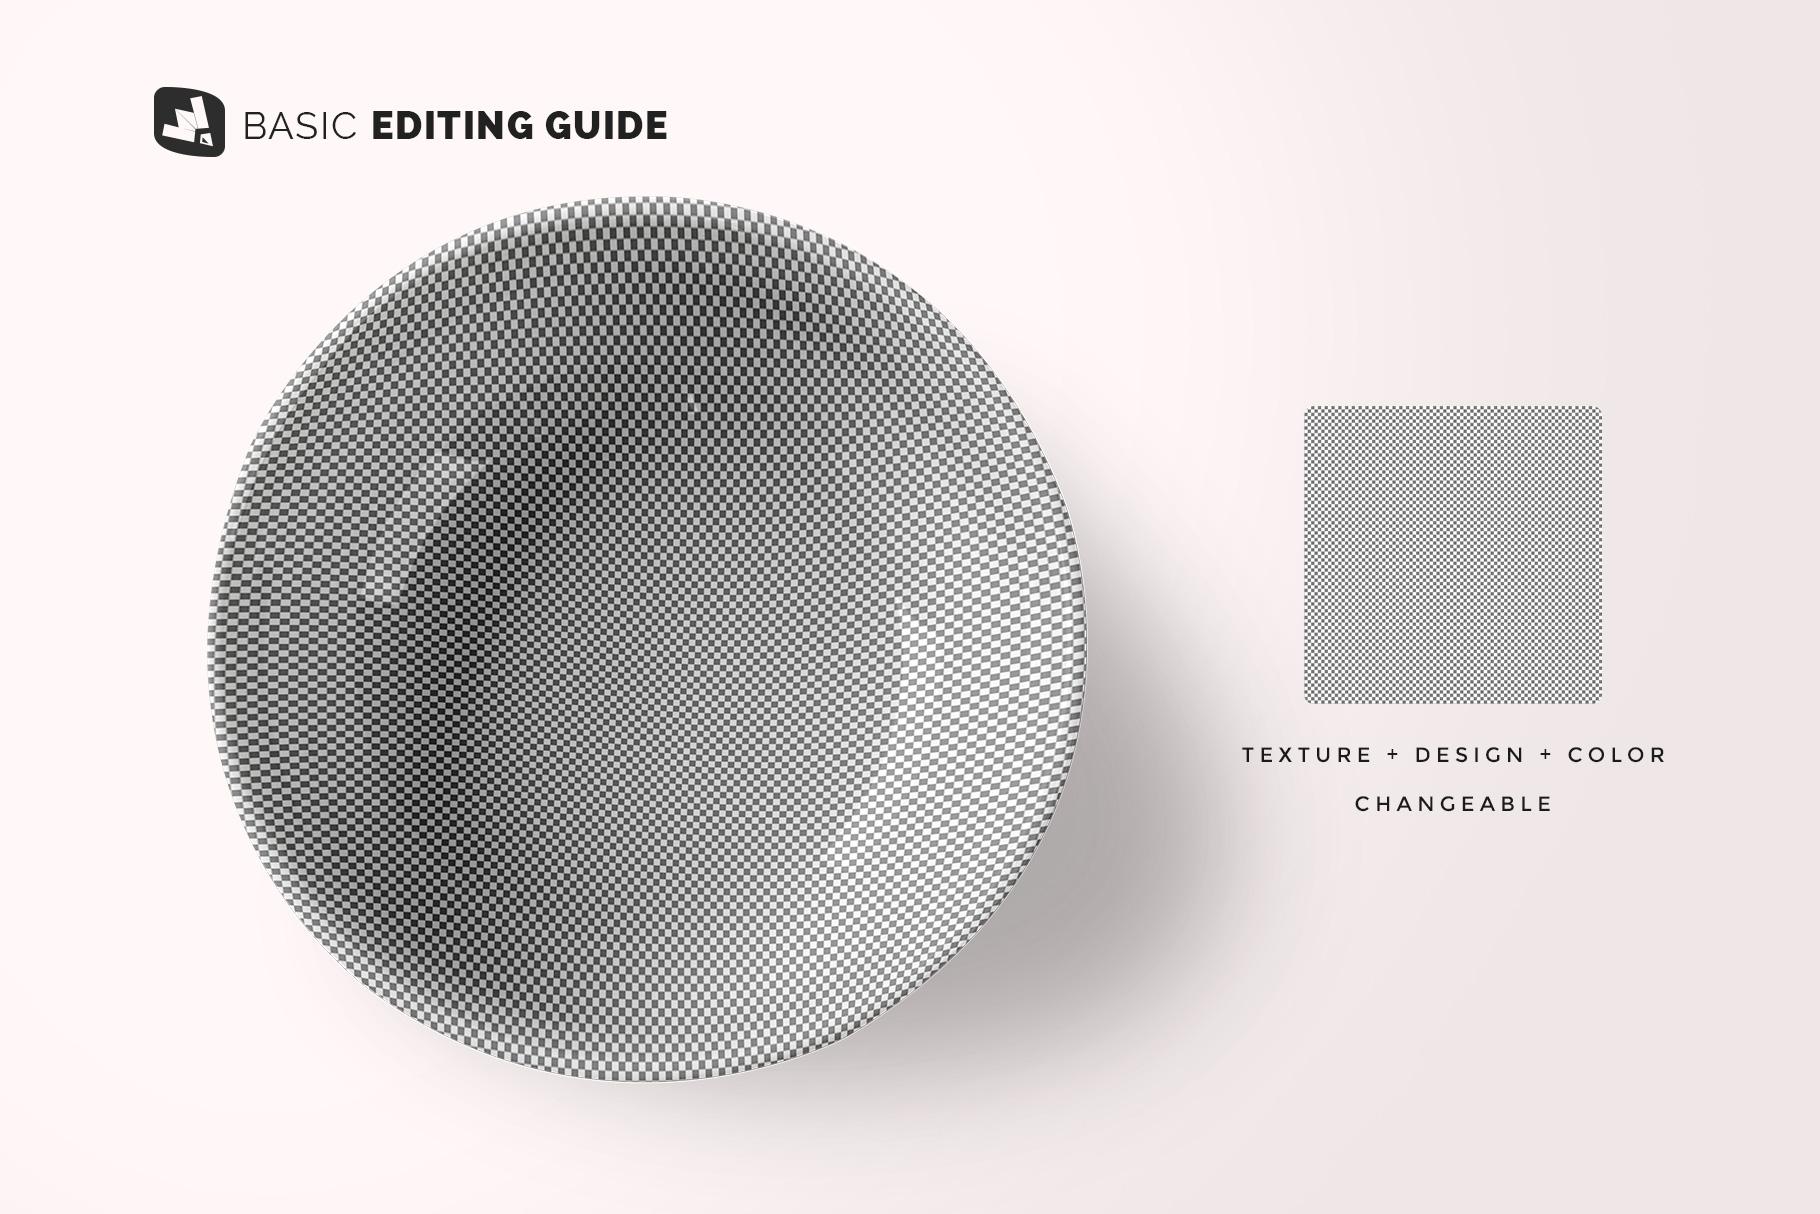 editability of the top view deep ceramic bowl mockup